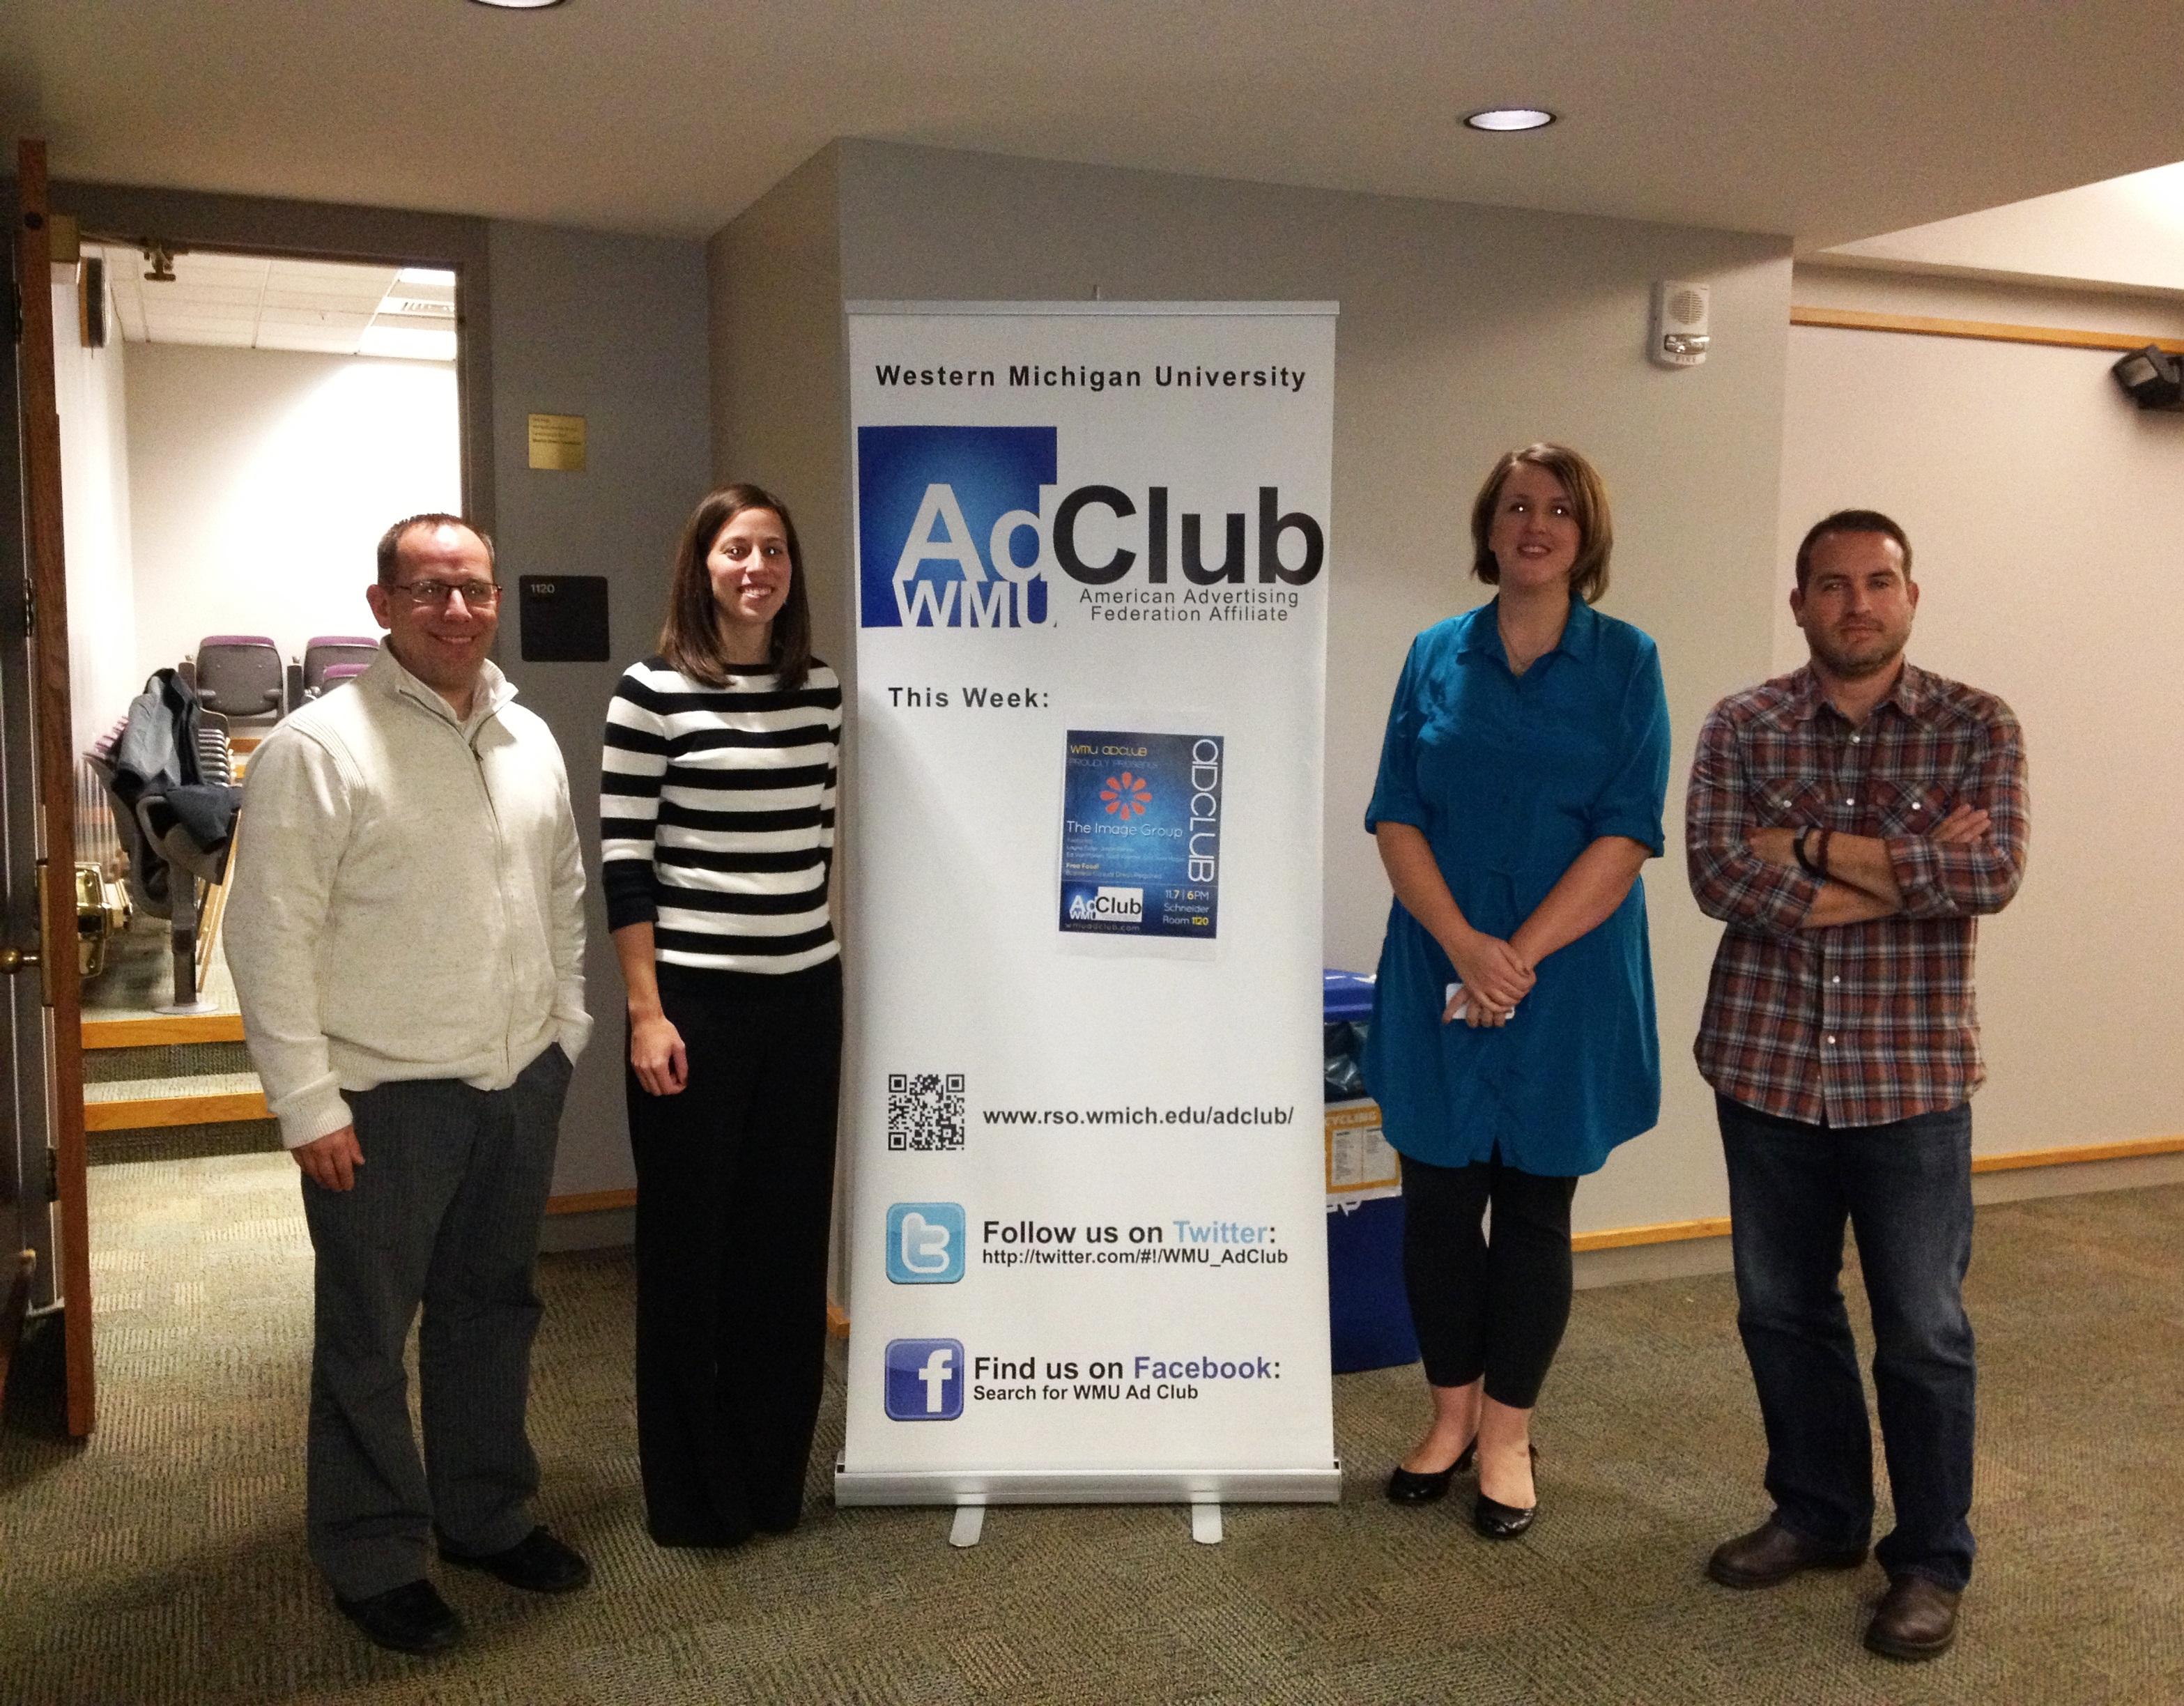 Image Group at AdClub